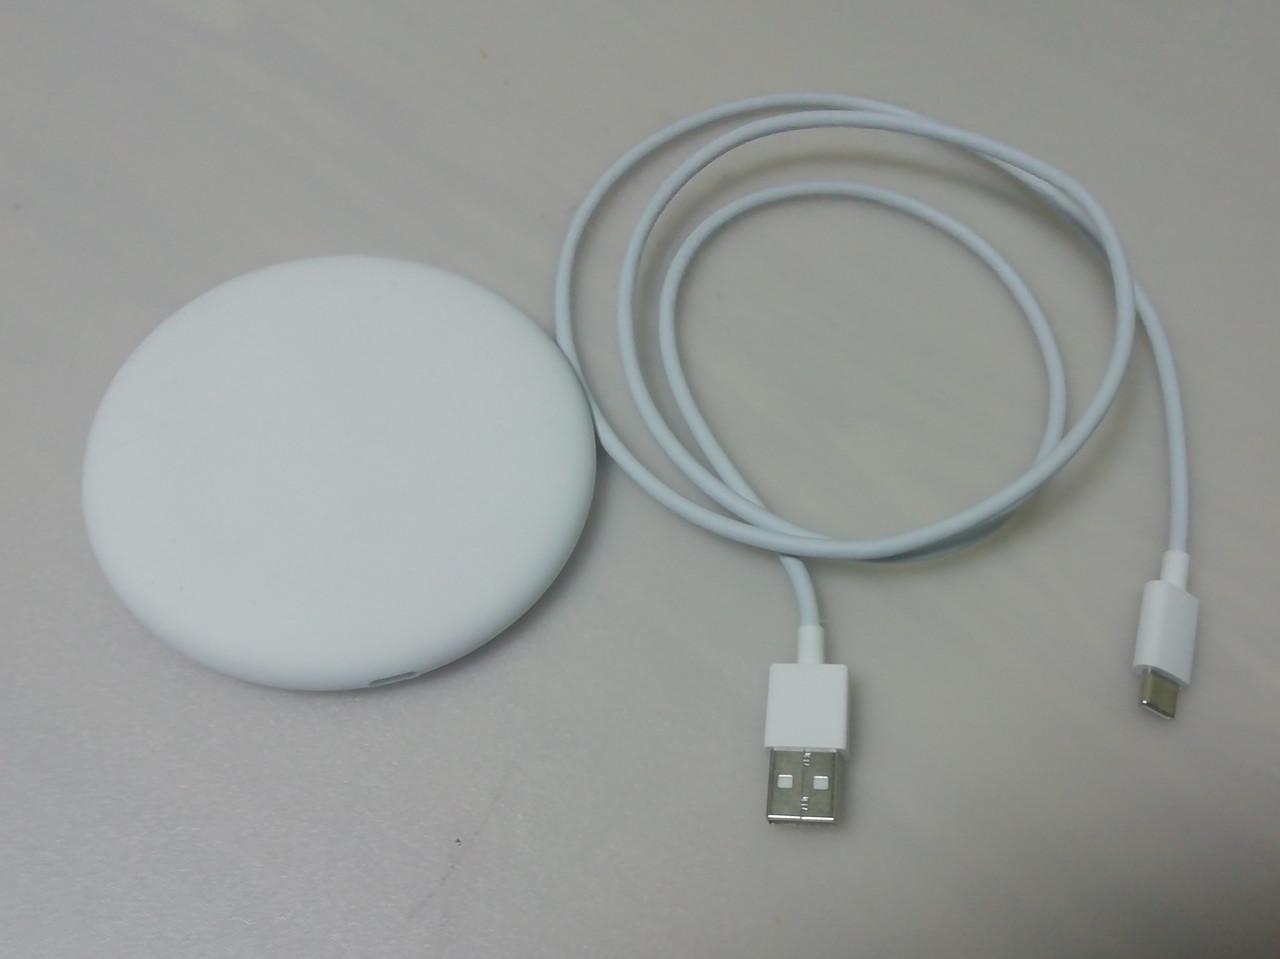 Беспроводное зарядное устройство Xiaomi Mi Wireless Charger White (MDY-09EF)